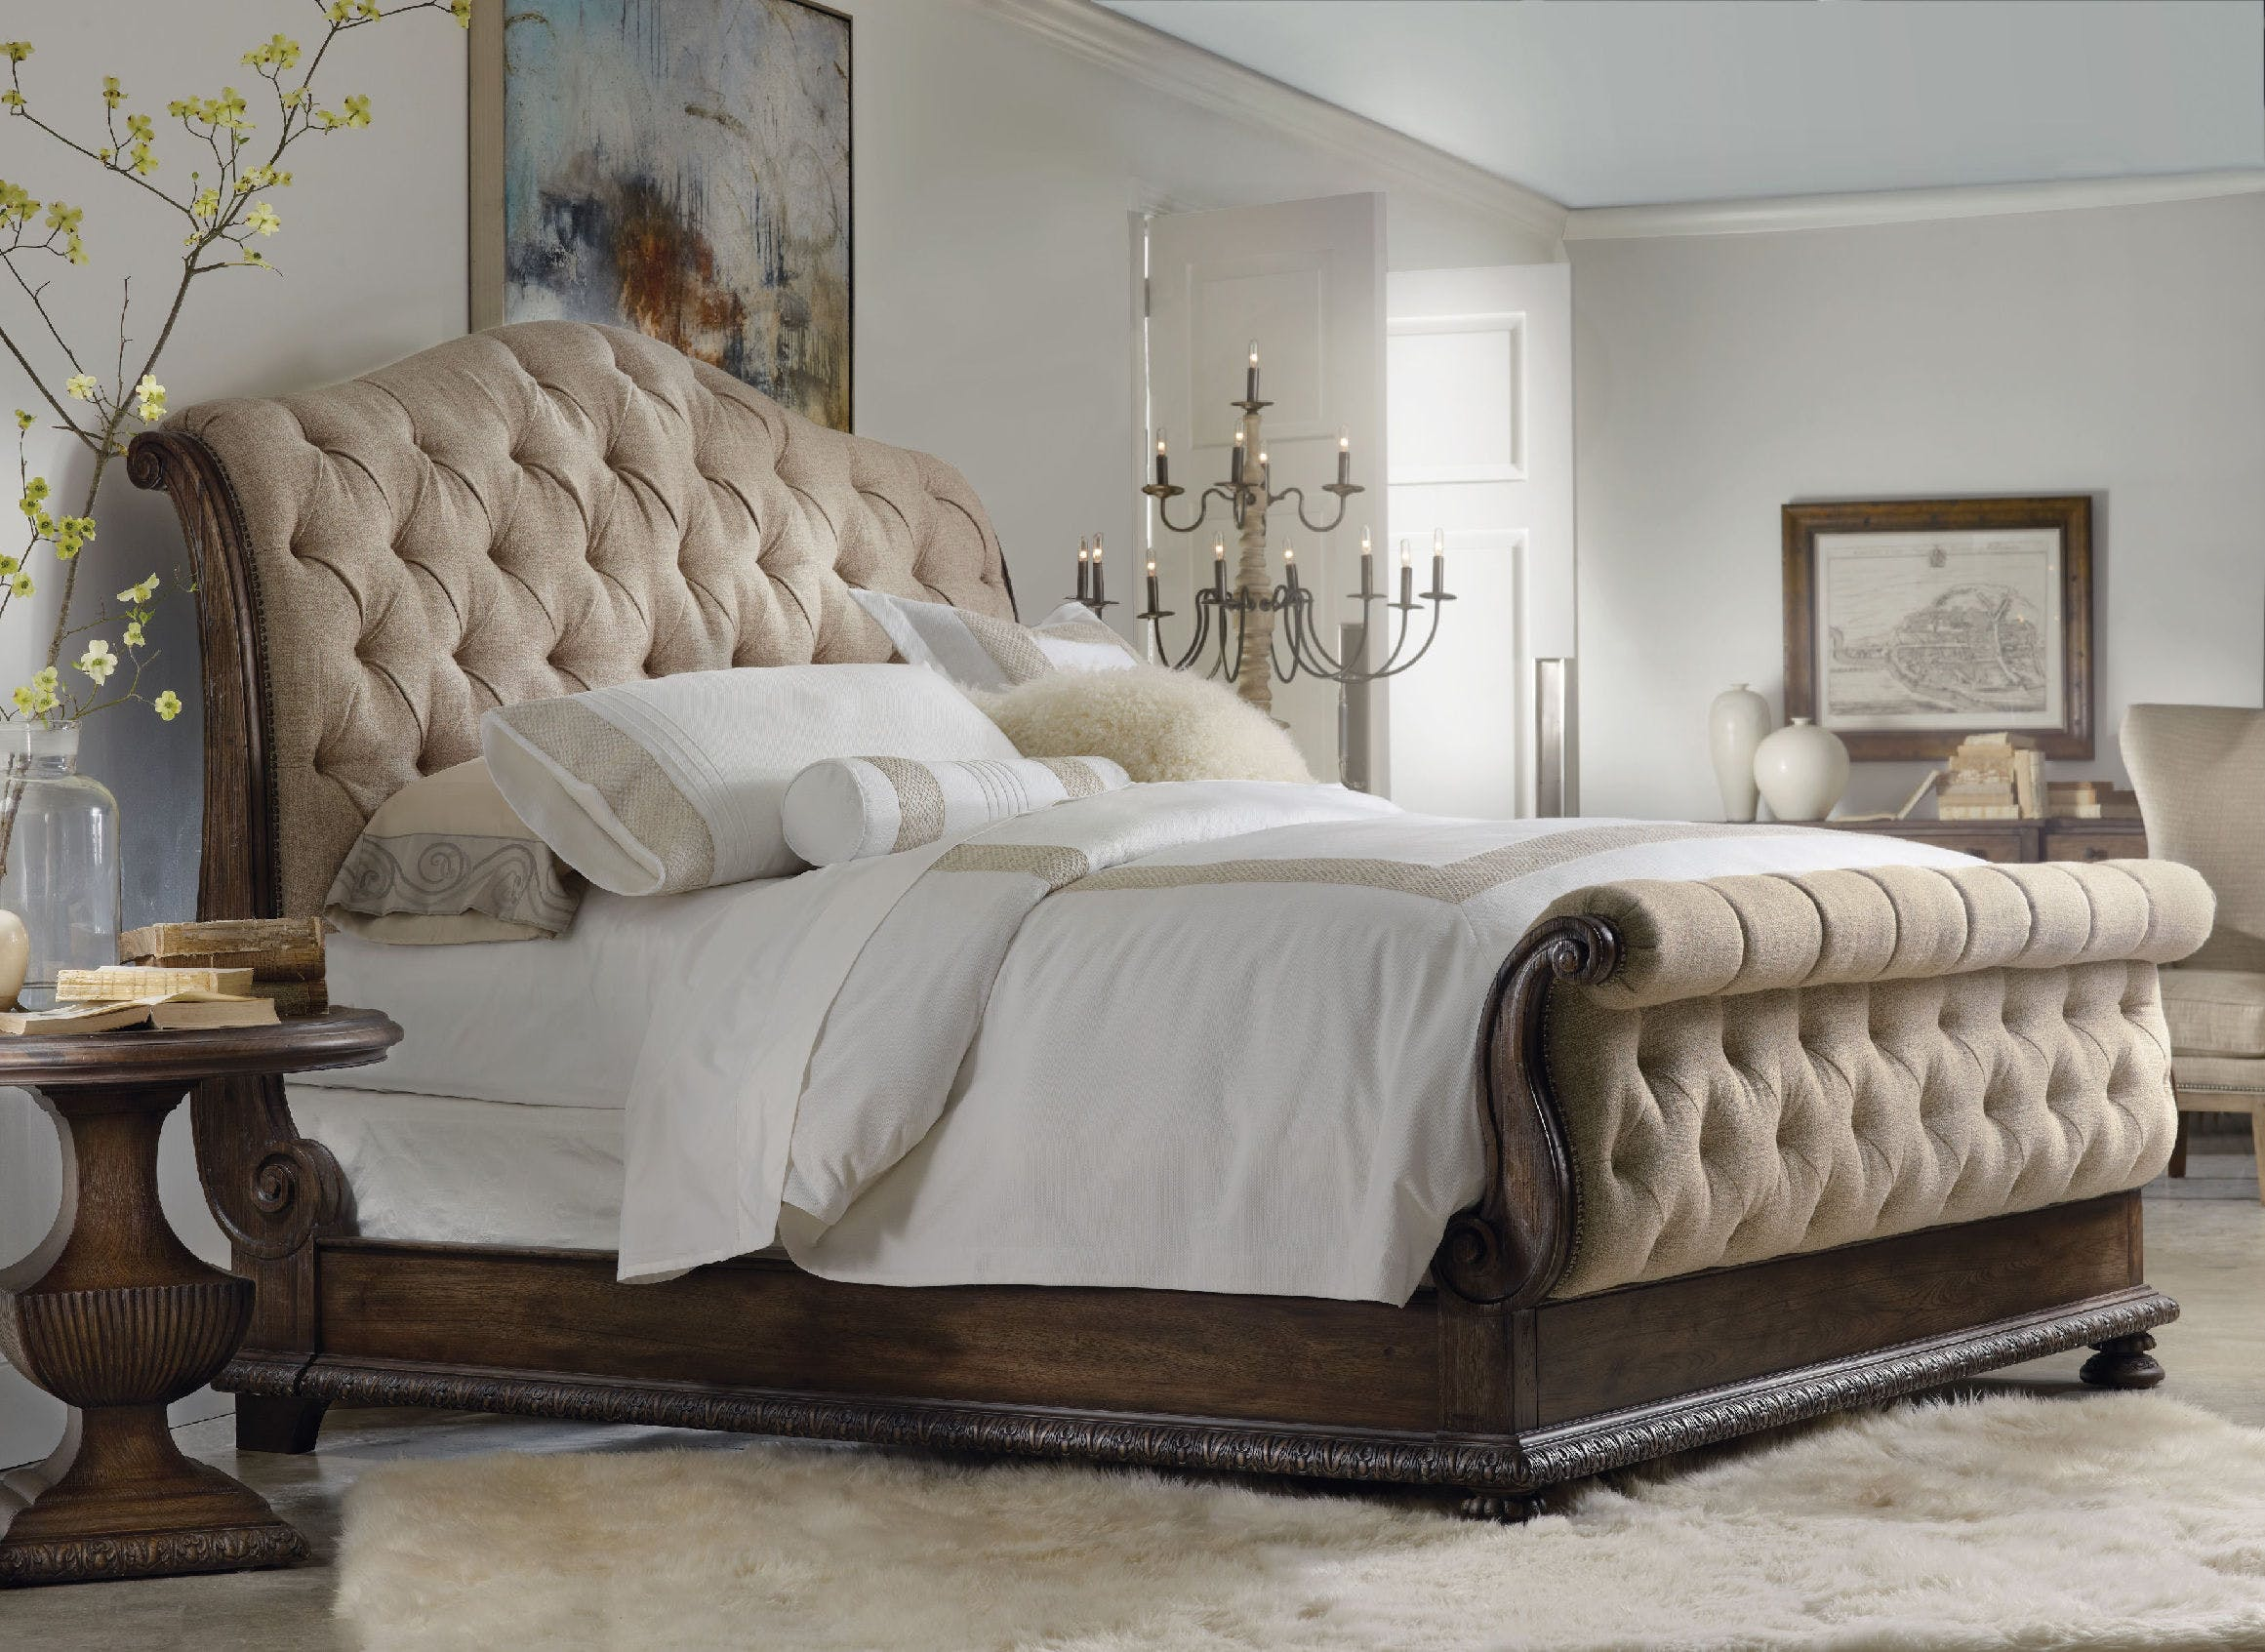 Hooker Furniture Bedroom Rhapsody King Tufted Bed 5070 90566